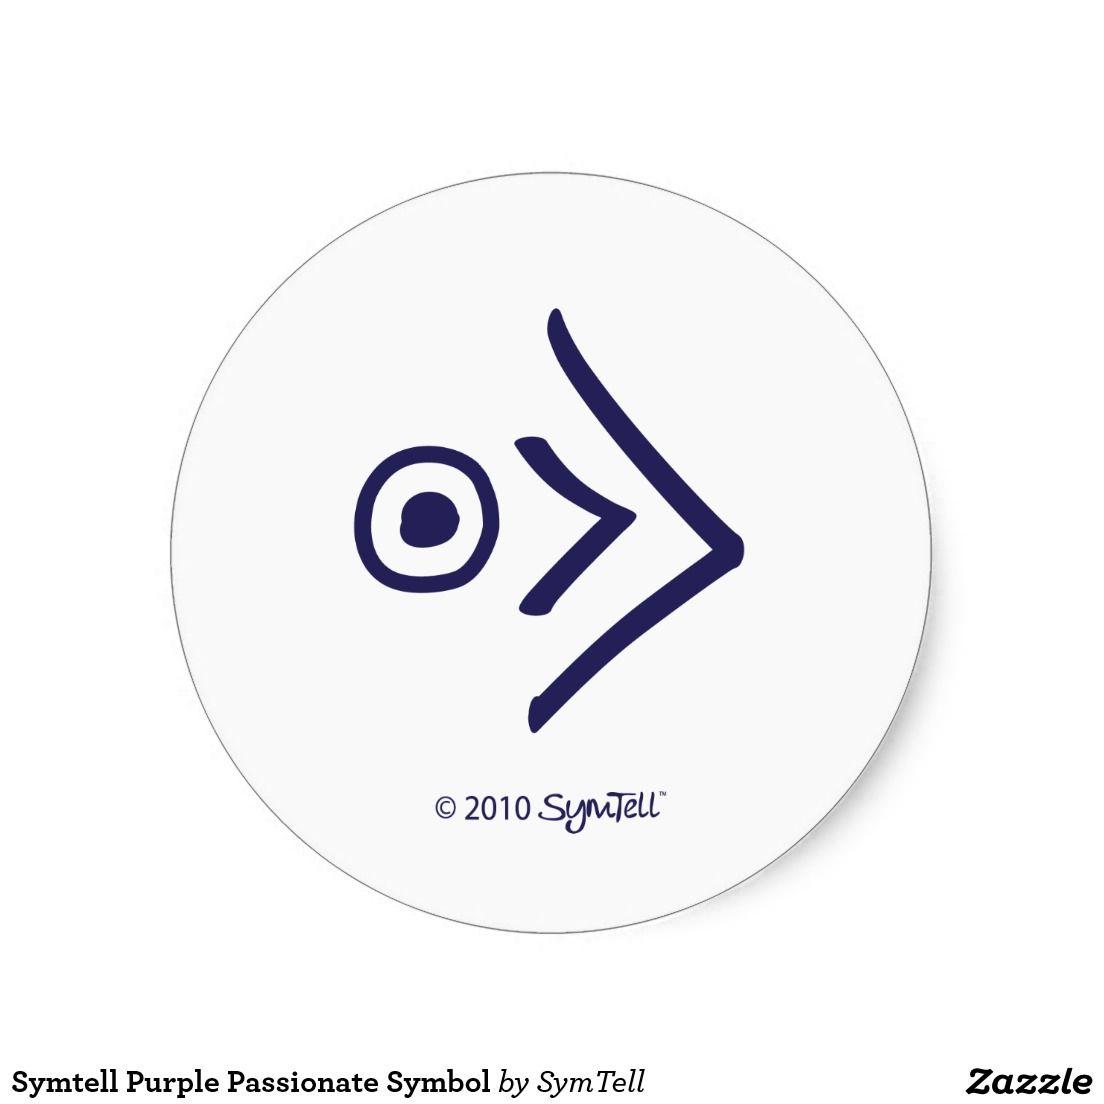 Symtell purple passionate symbol classic round sticker round symtell purple passionate symbol round sticker biocorpaavc Images